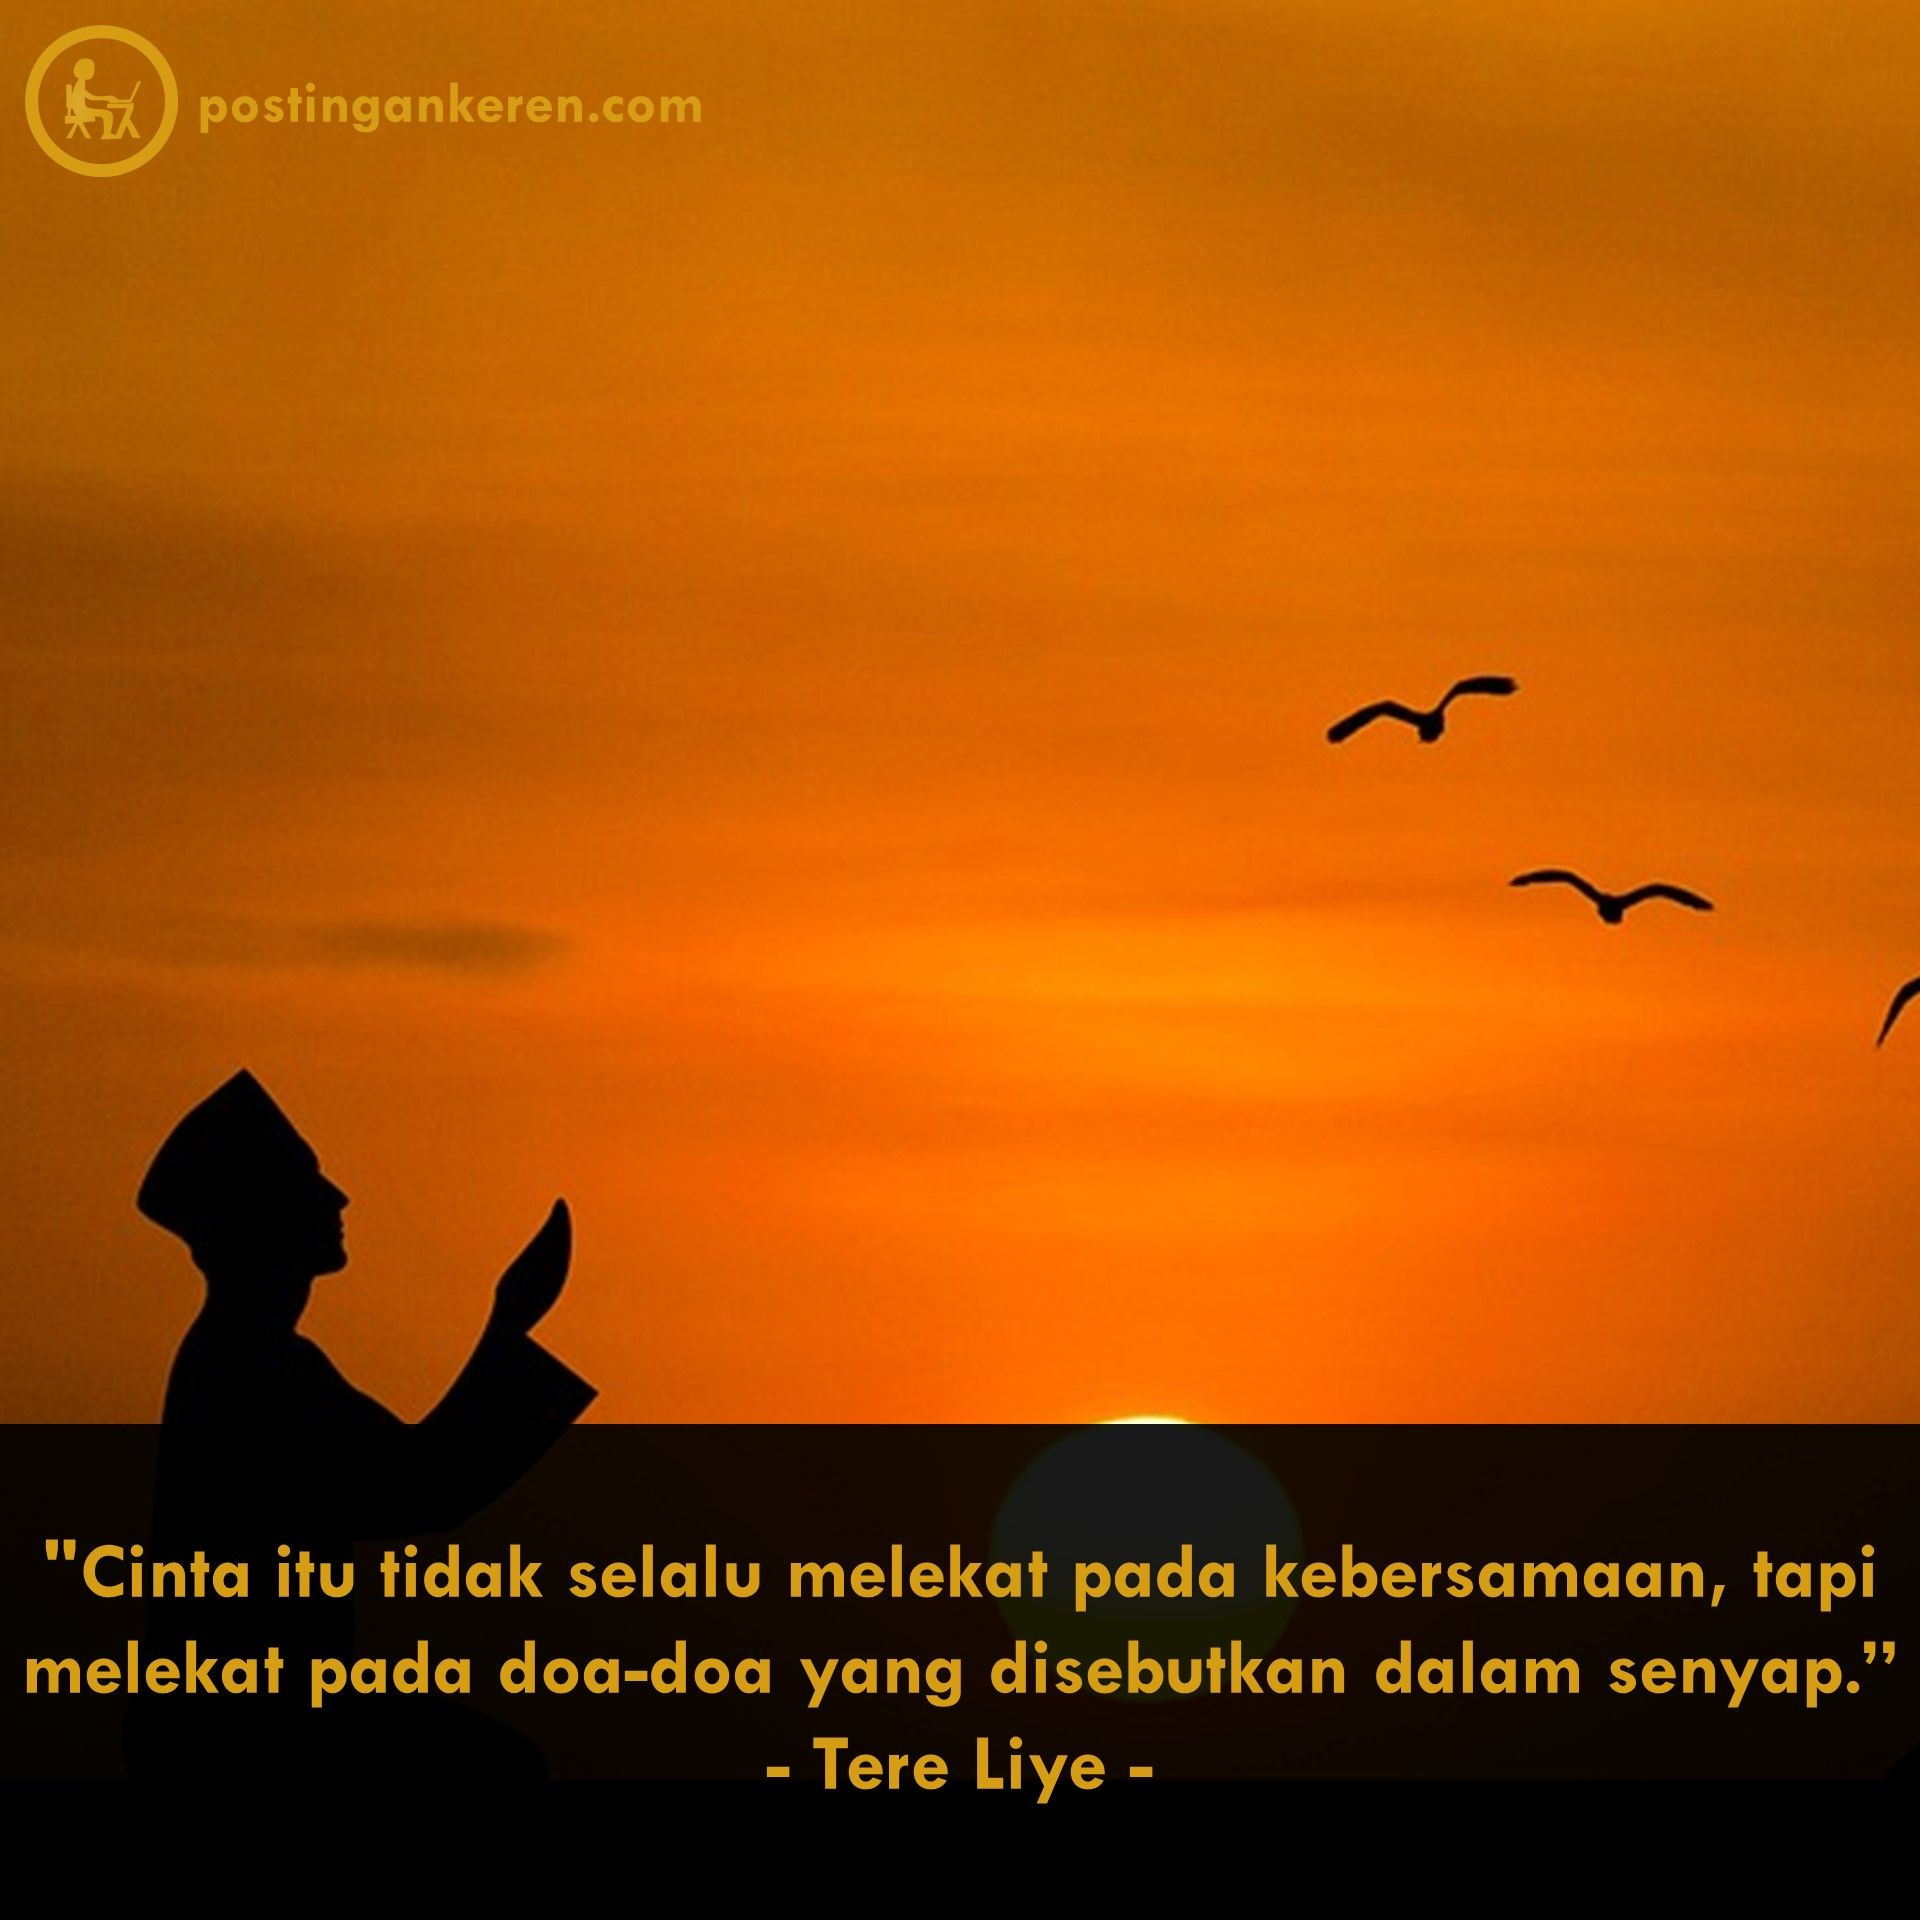 Quotes Cinta Tere Liye Doa Persamaan Bijak